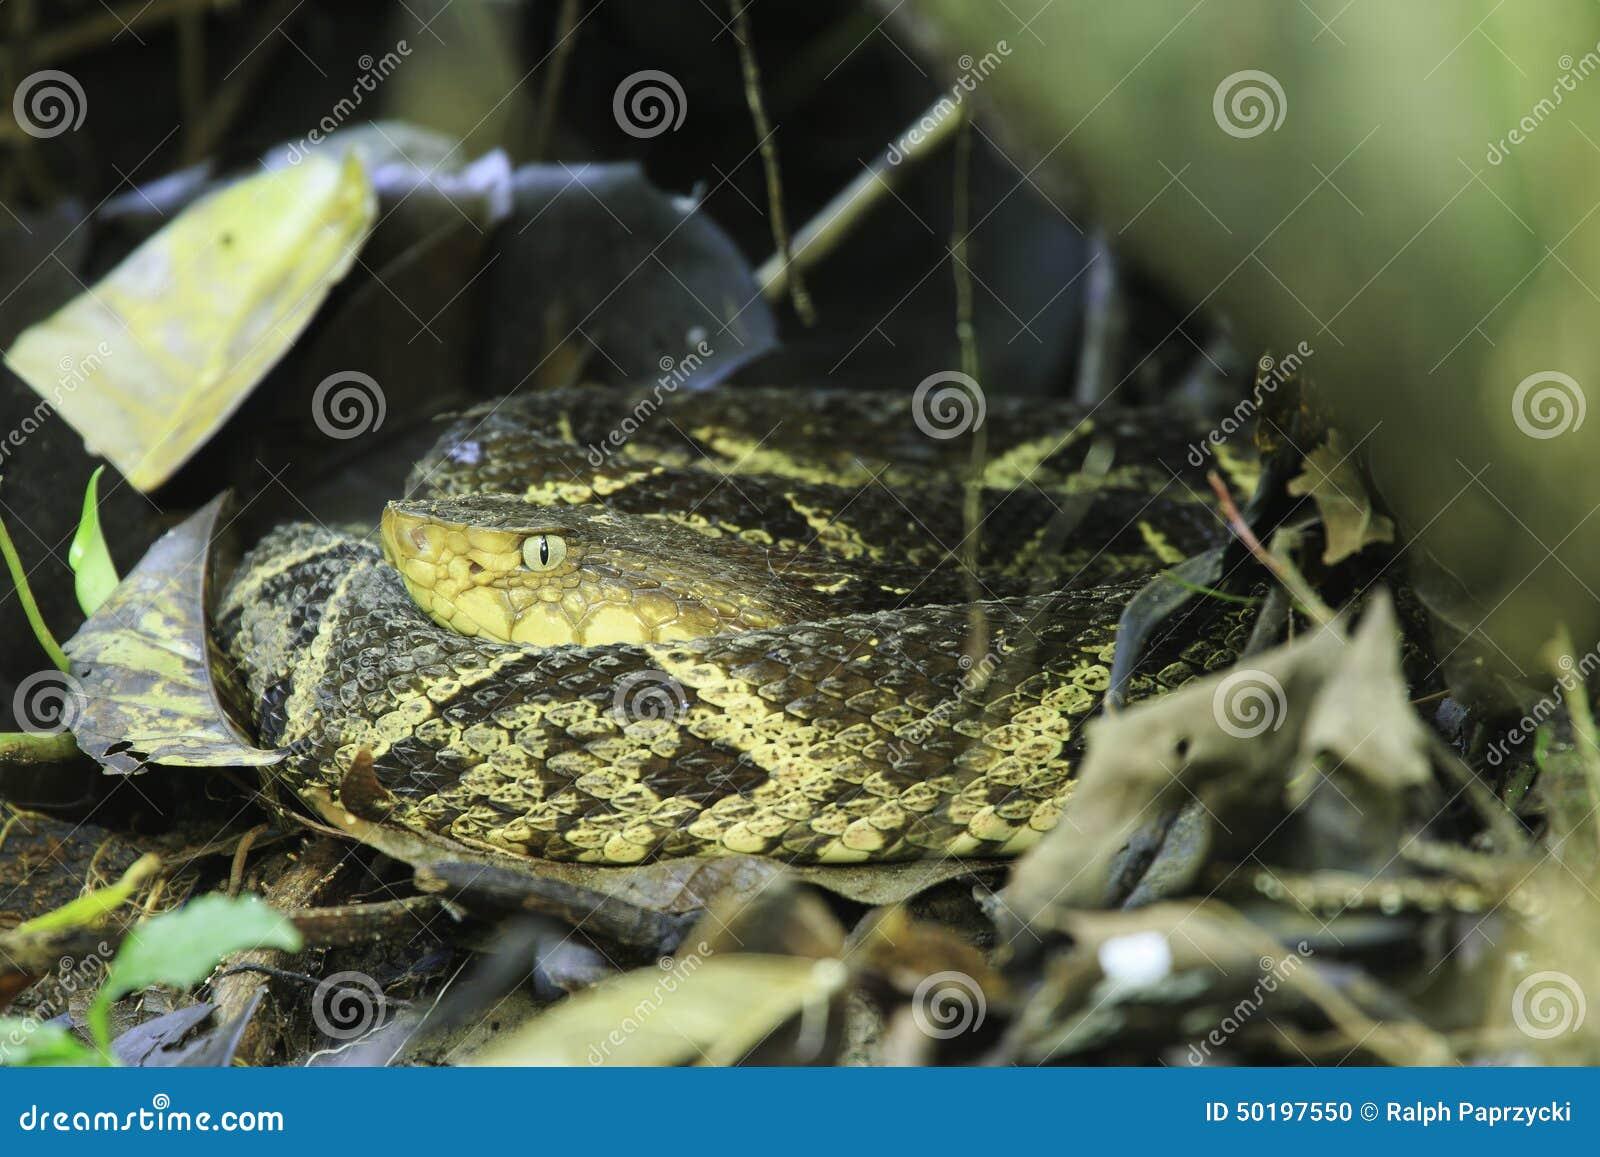 Fer de长矛(具窍蝮蛇属asper),哥斯达黎加